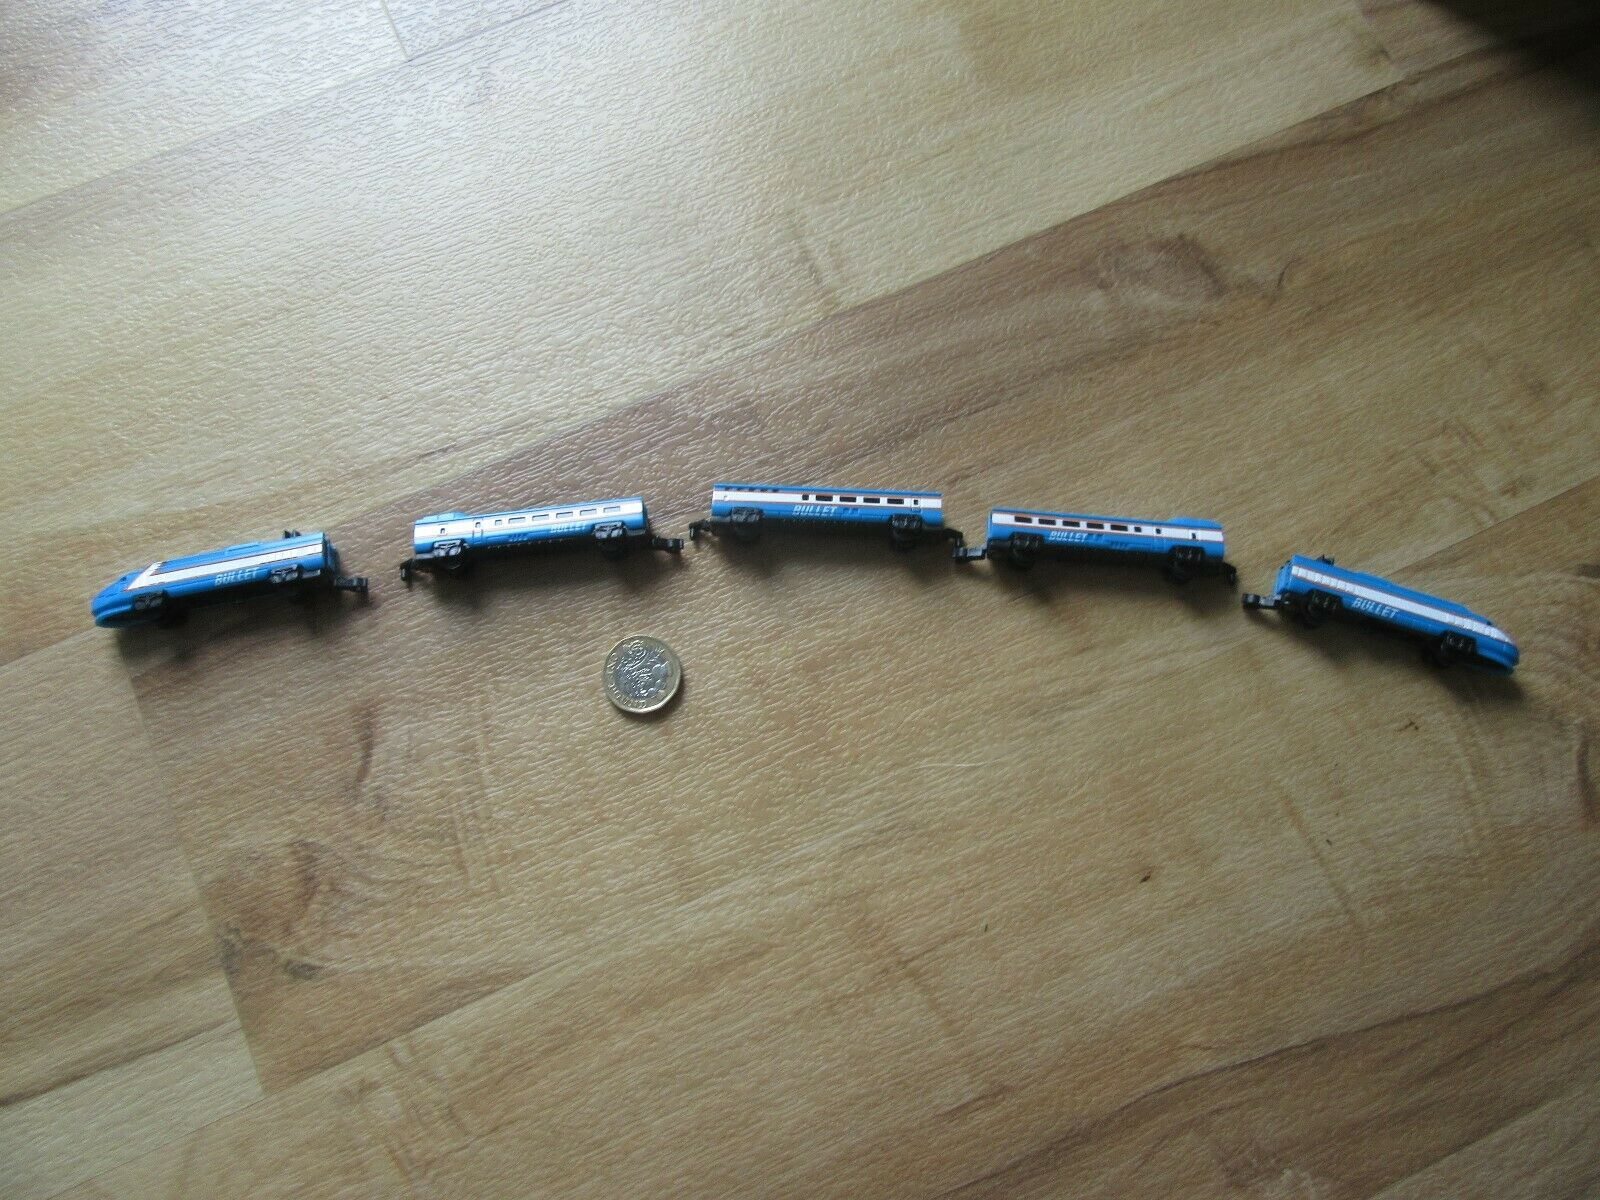 SUPER RARE LOT MICRO MA NES blu HIGH SPEED BULLET TRAIN RAREST OF tutti TRAIN